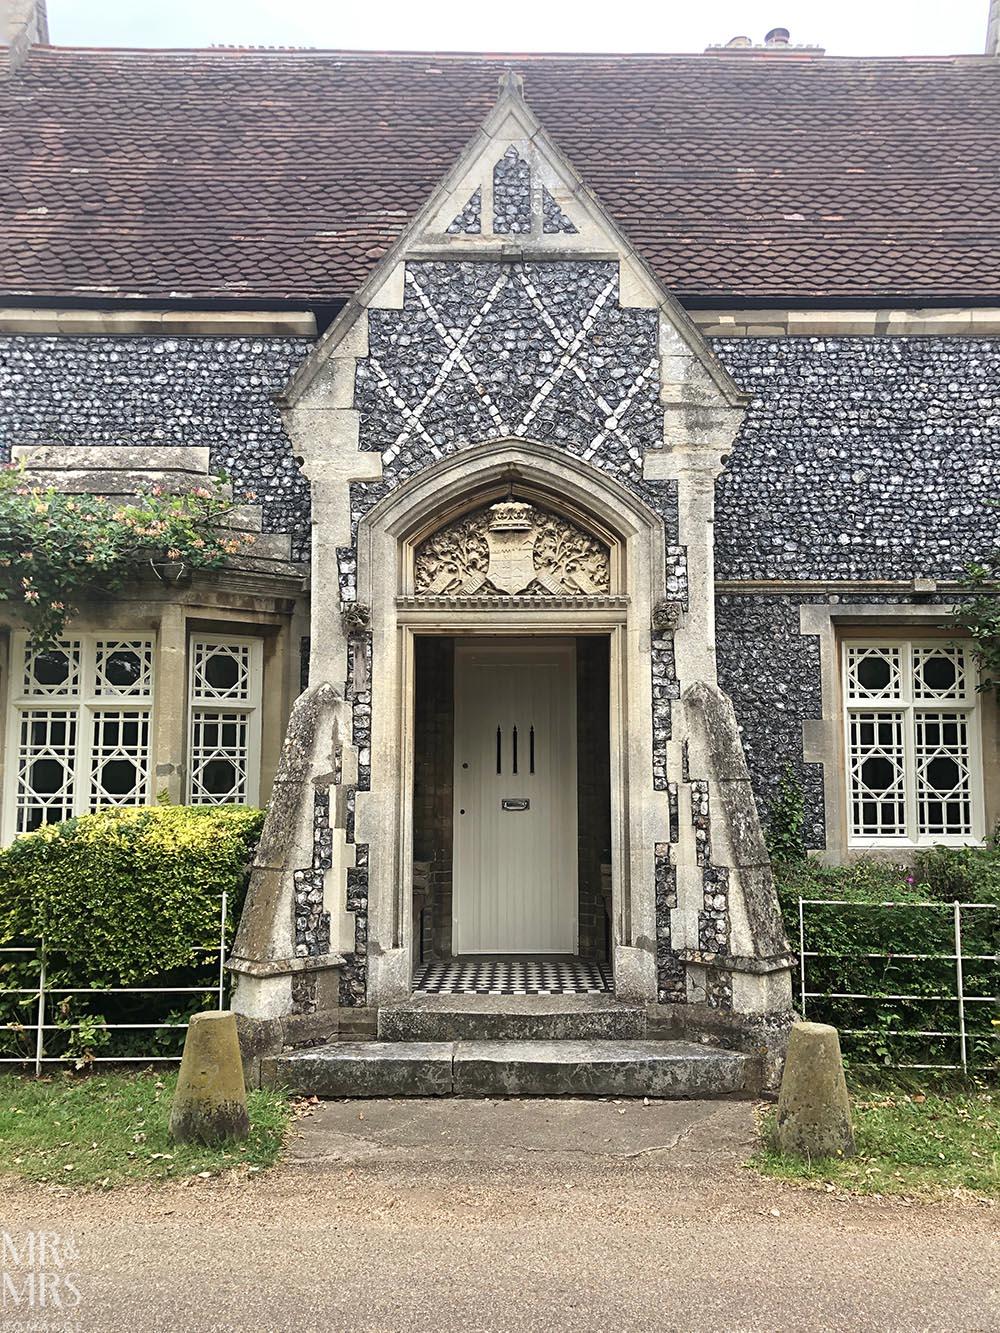 St Albans - gatehouse